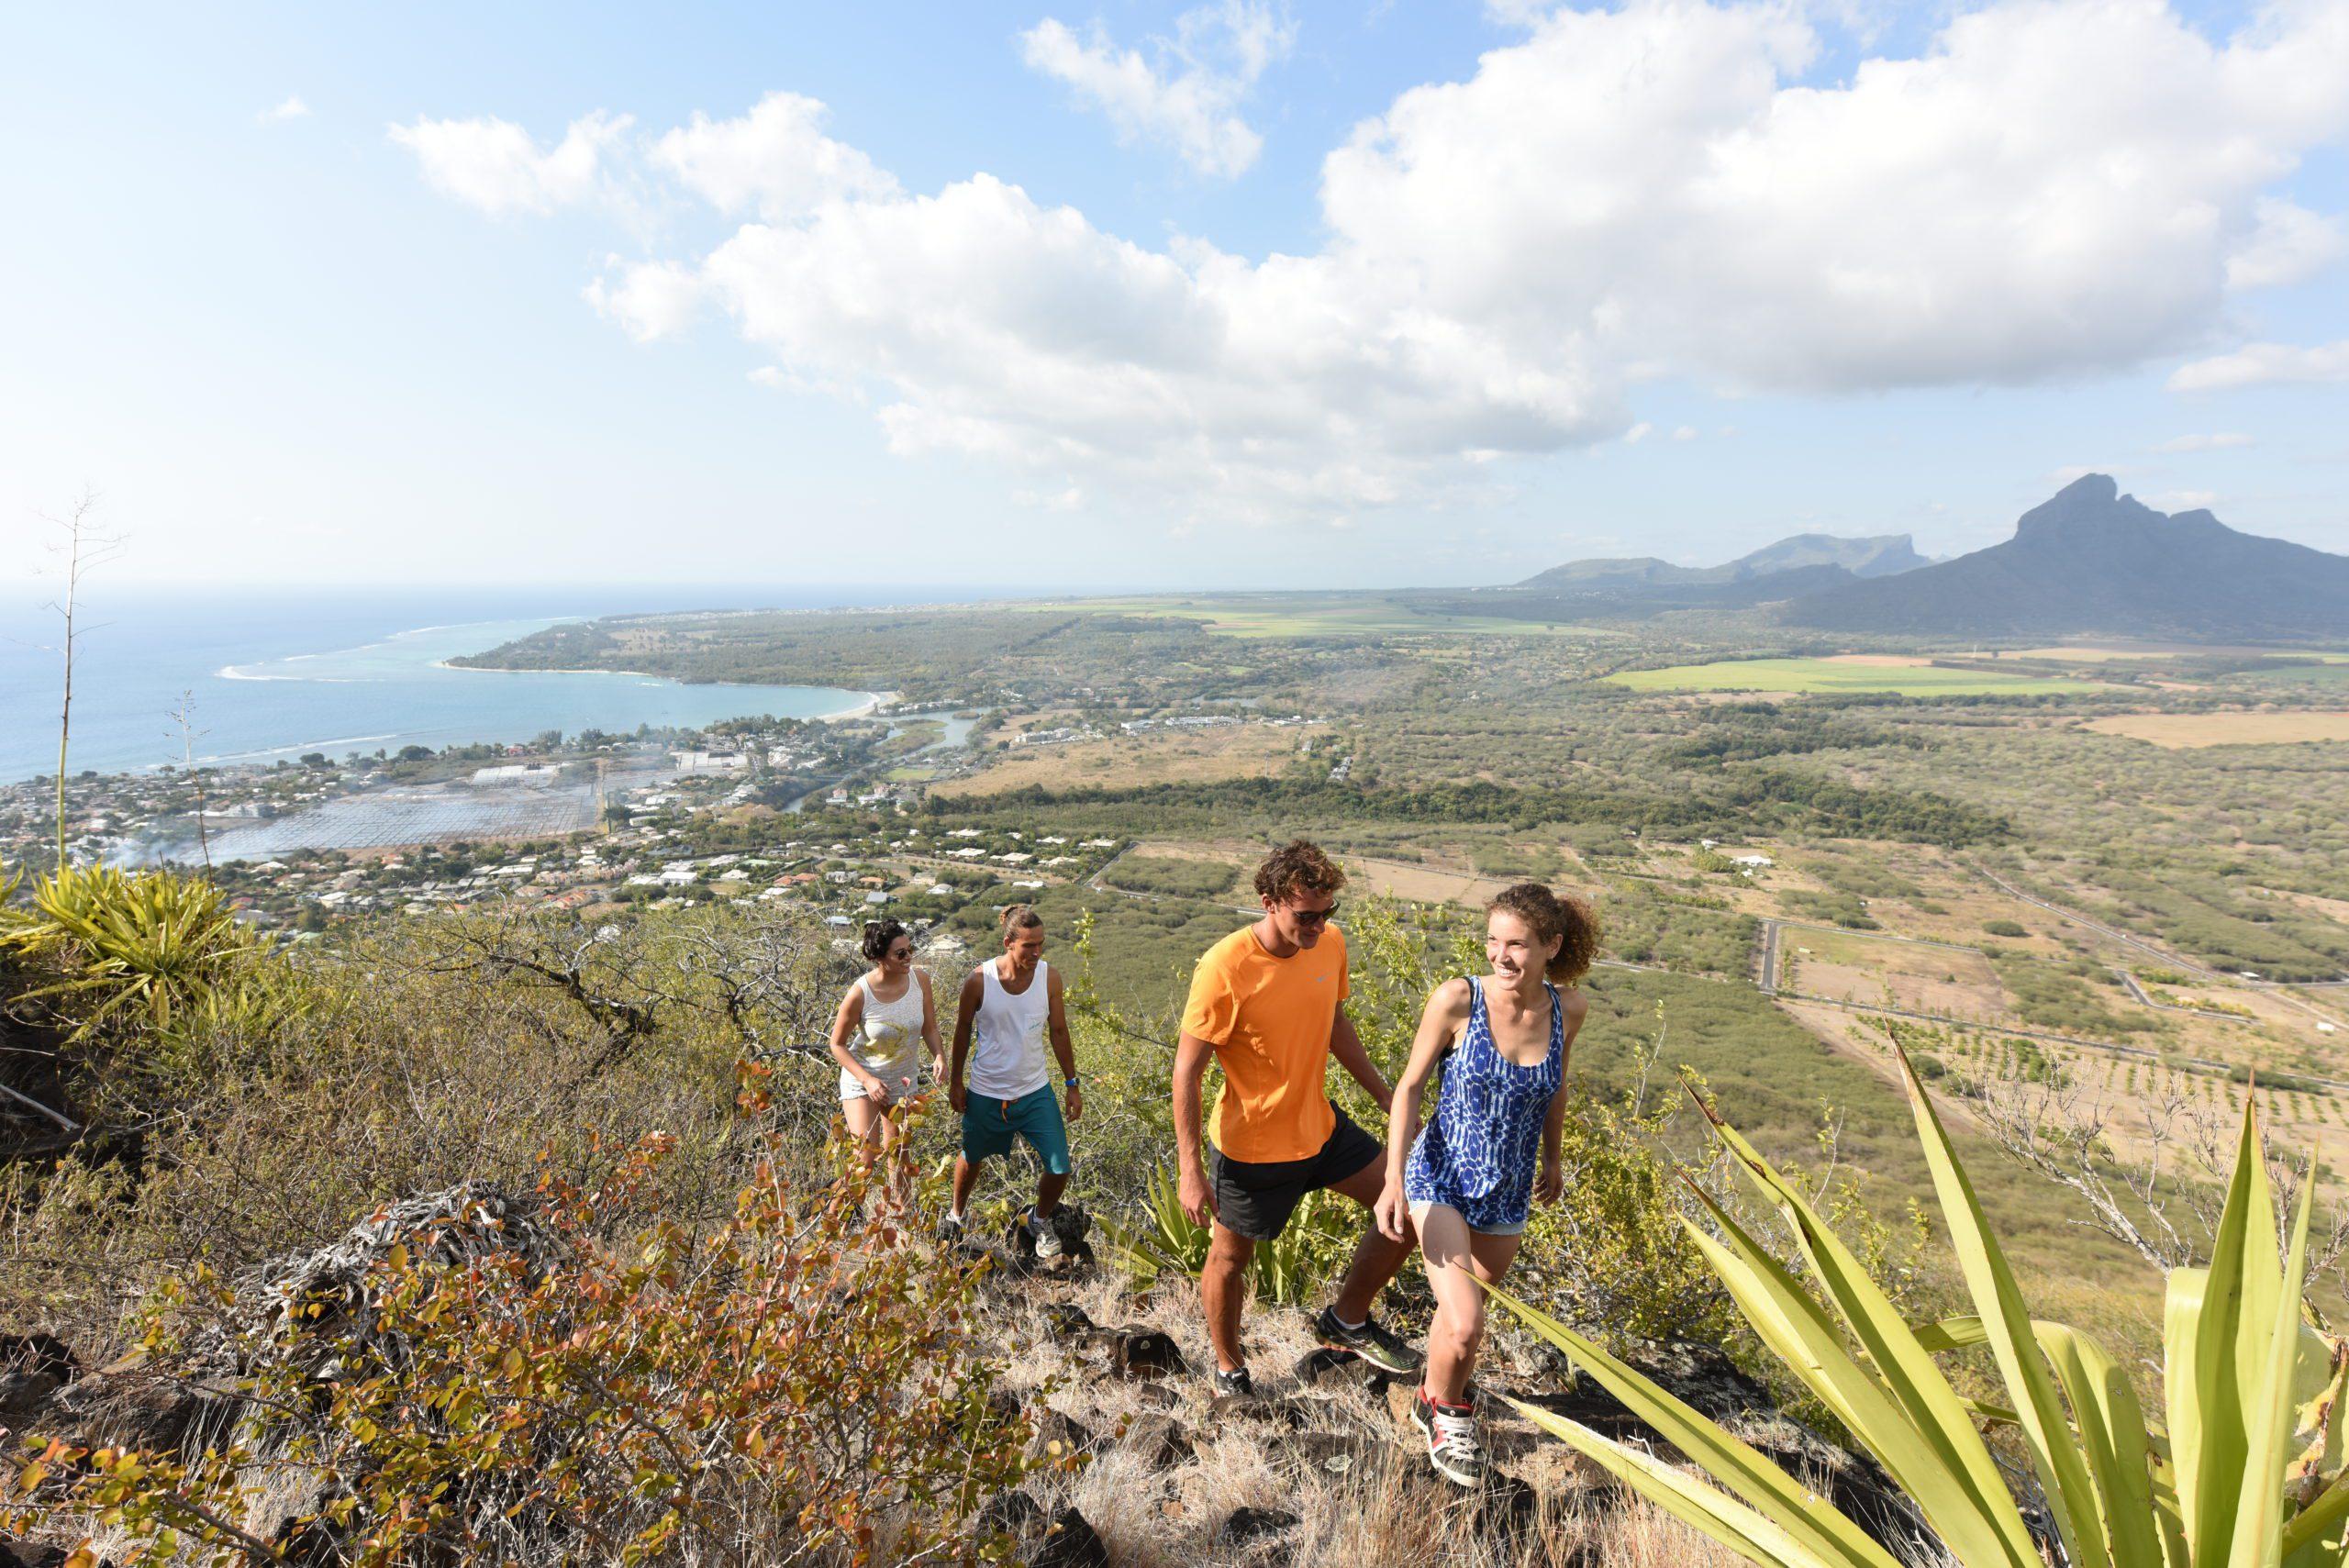 Mauritius couples hiking